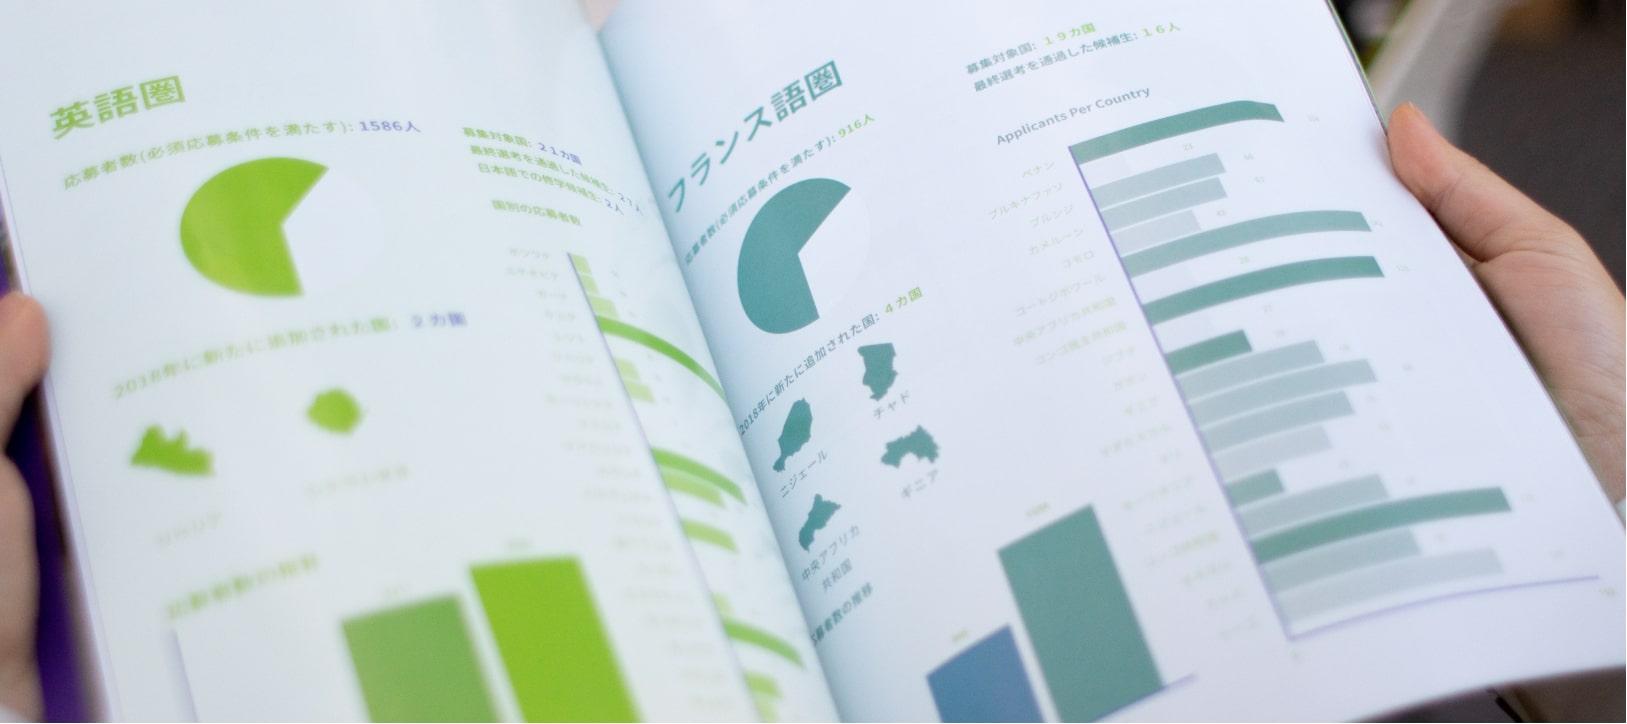 ashinaga-in-numbers_main-img